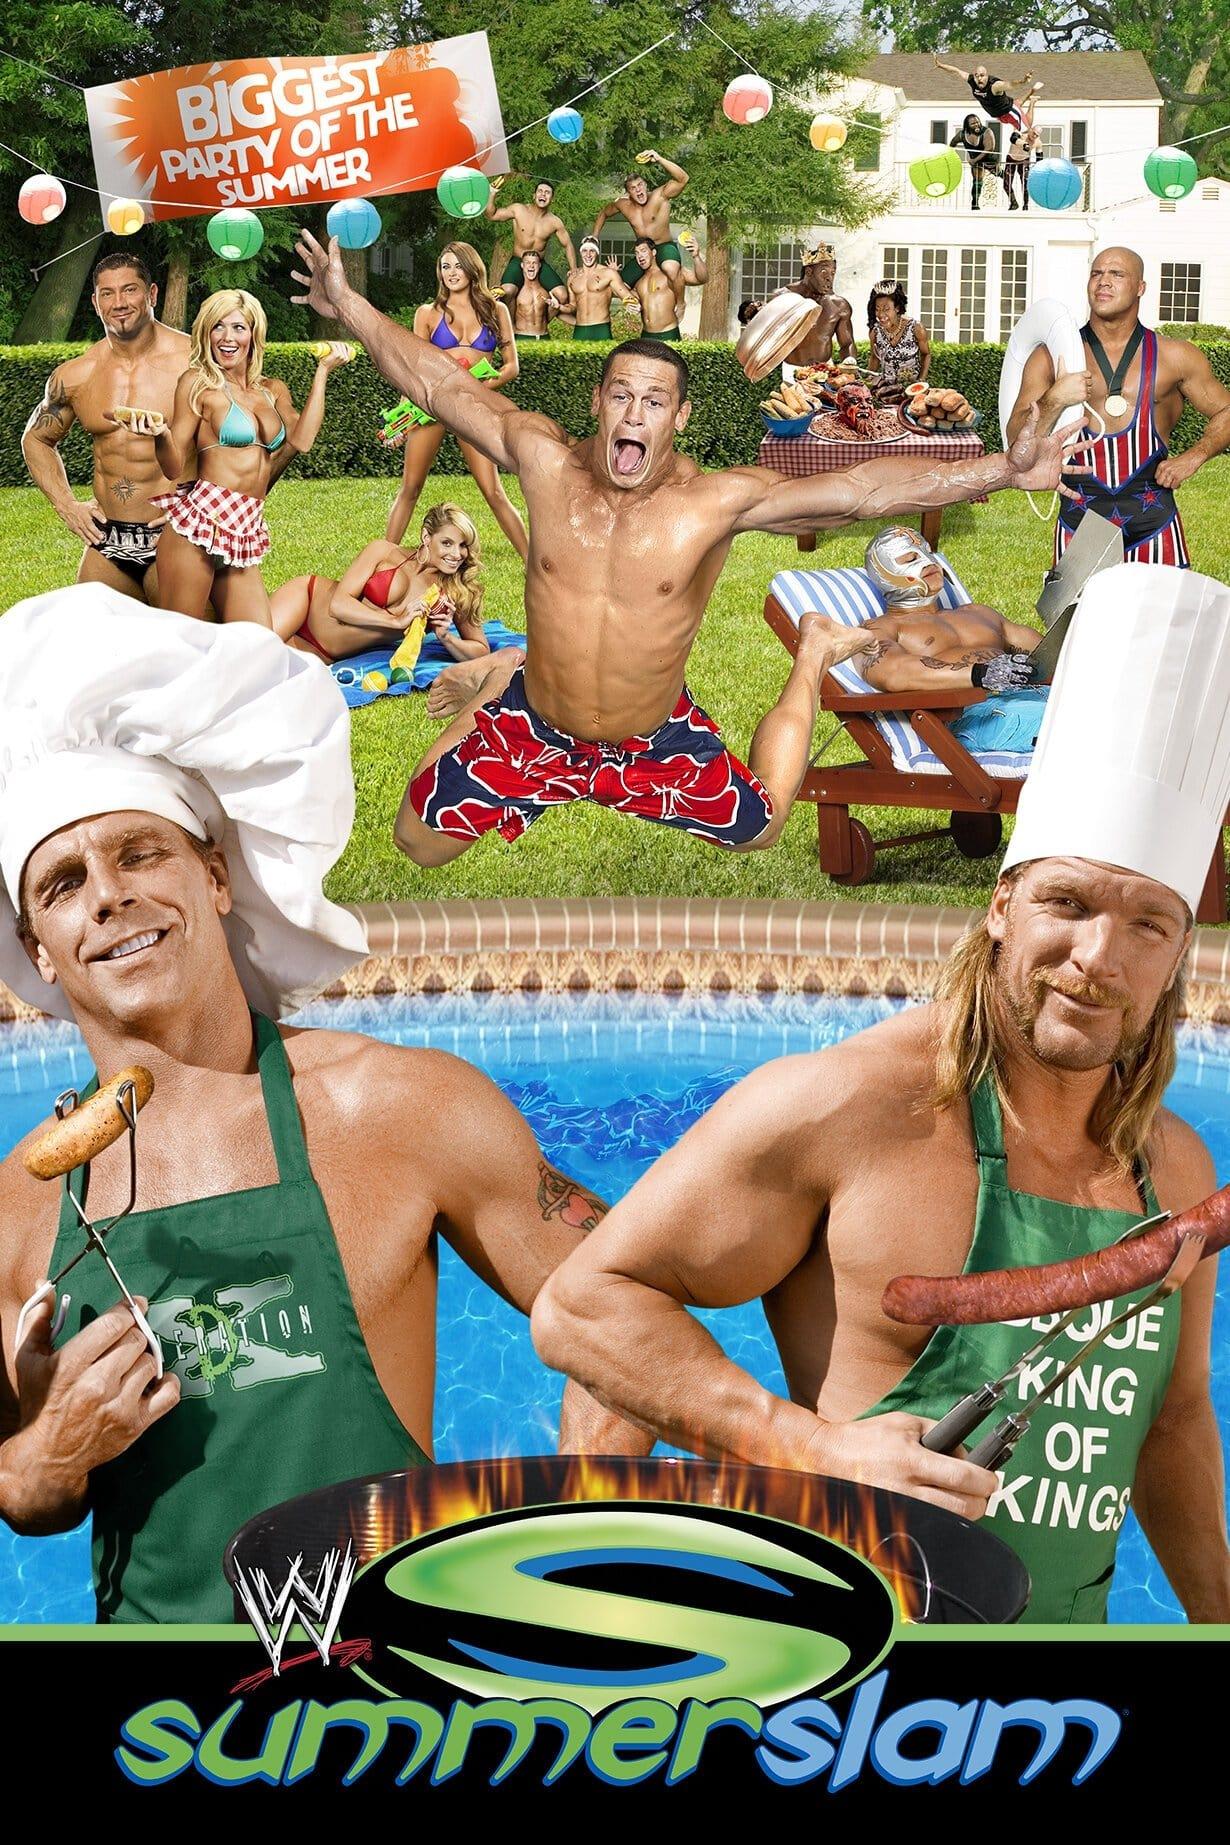 WWE SummerSlam 2006